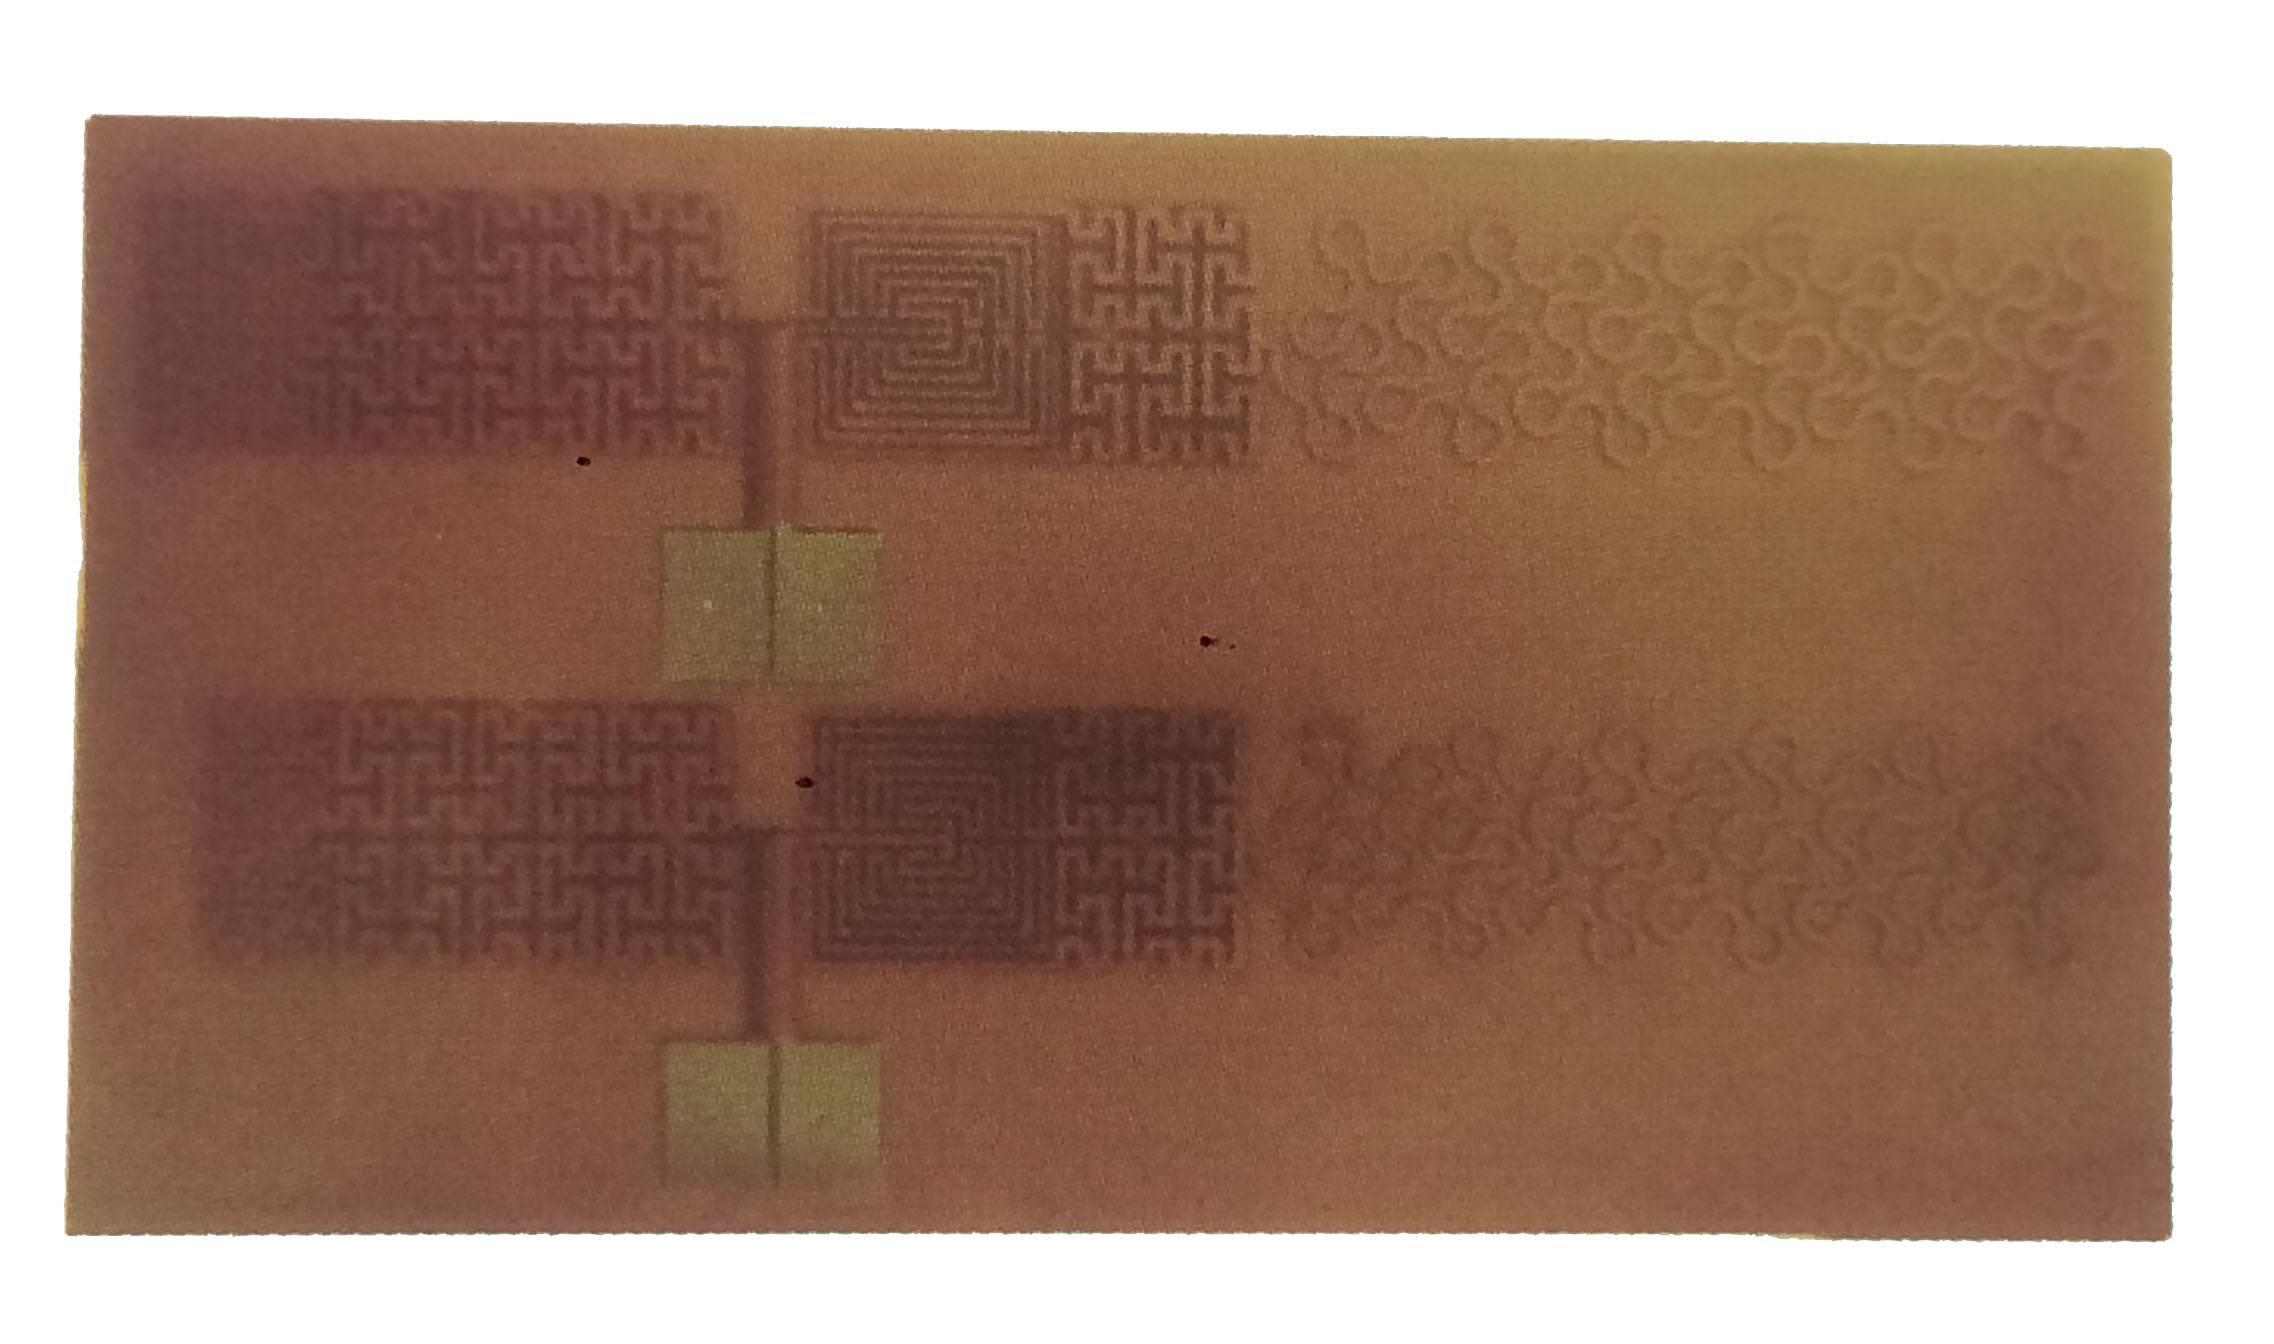 The ultrathin flexsible pcb board by shenbei factory Shenzhen